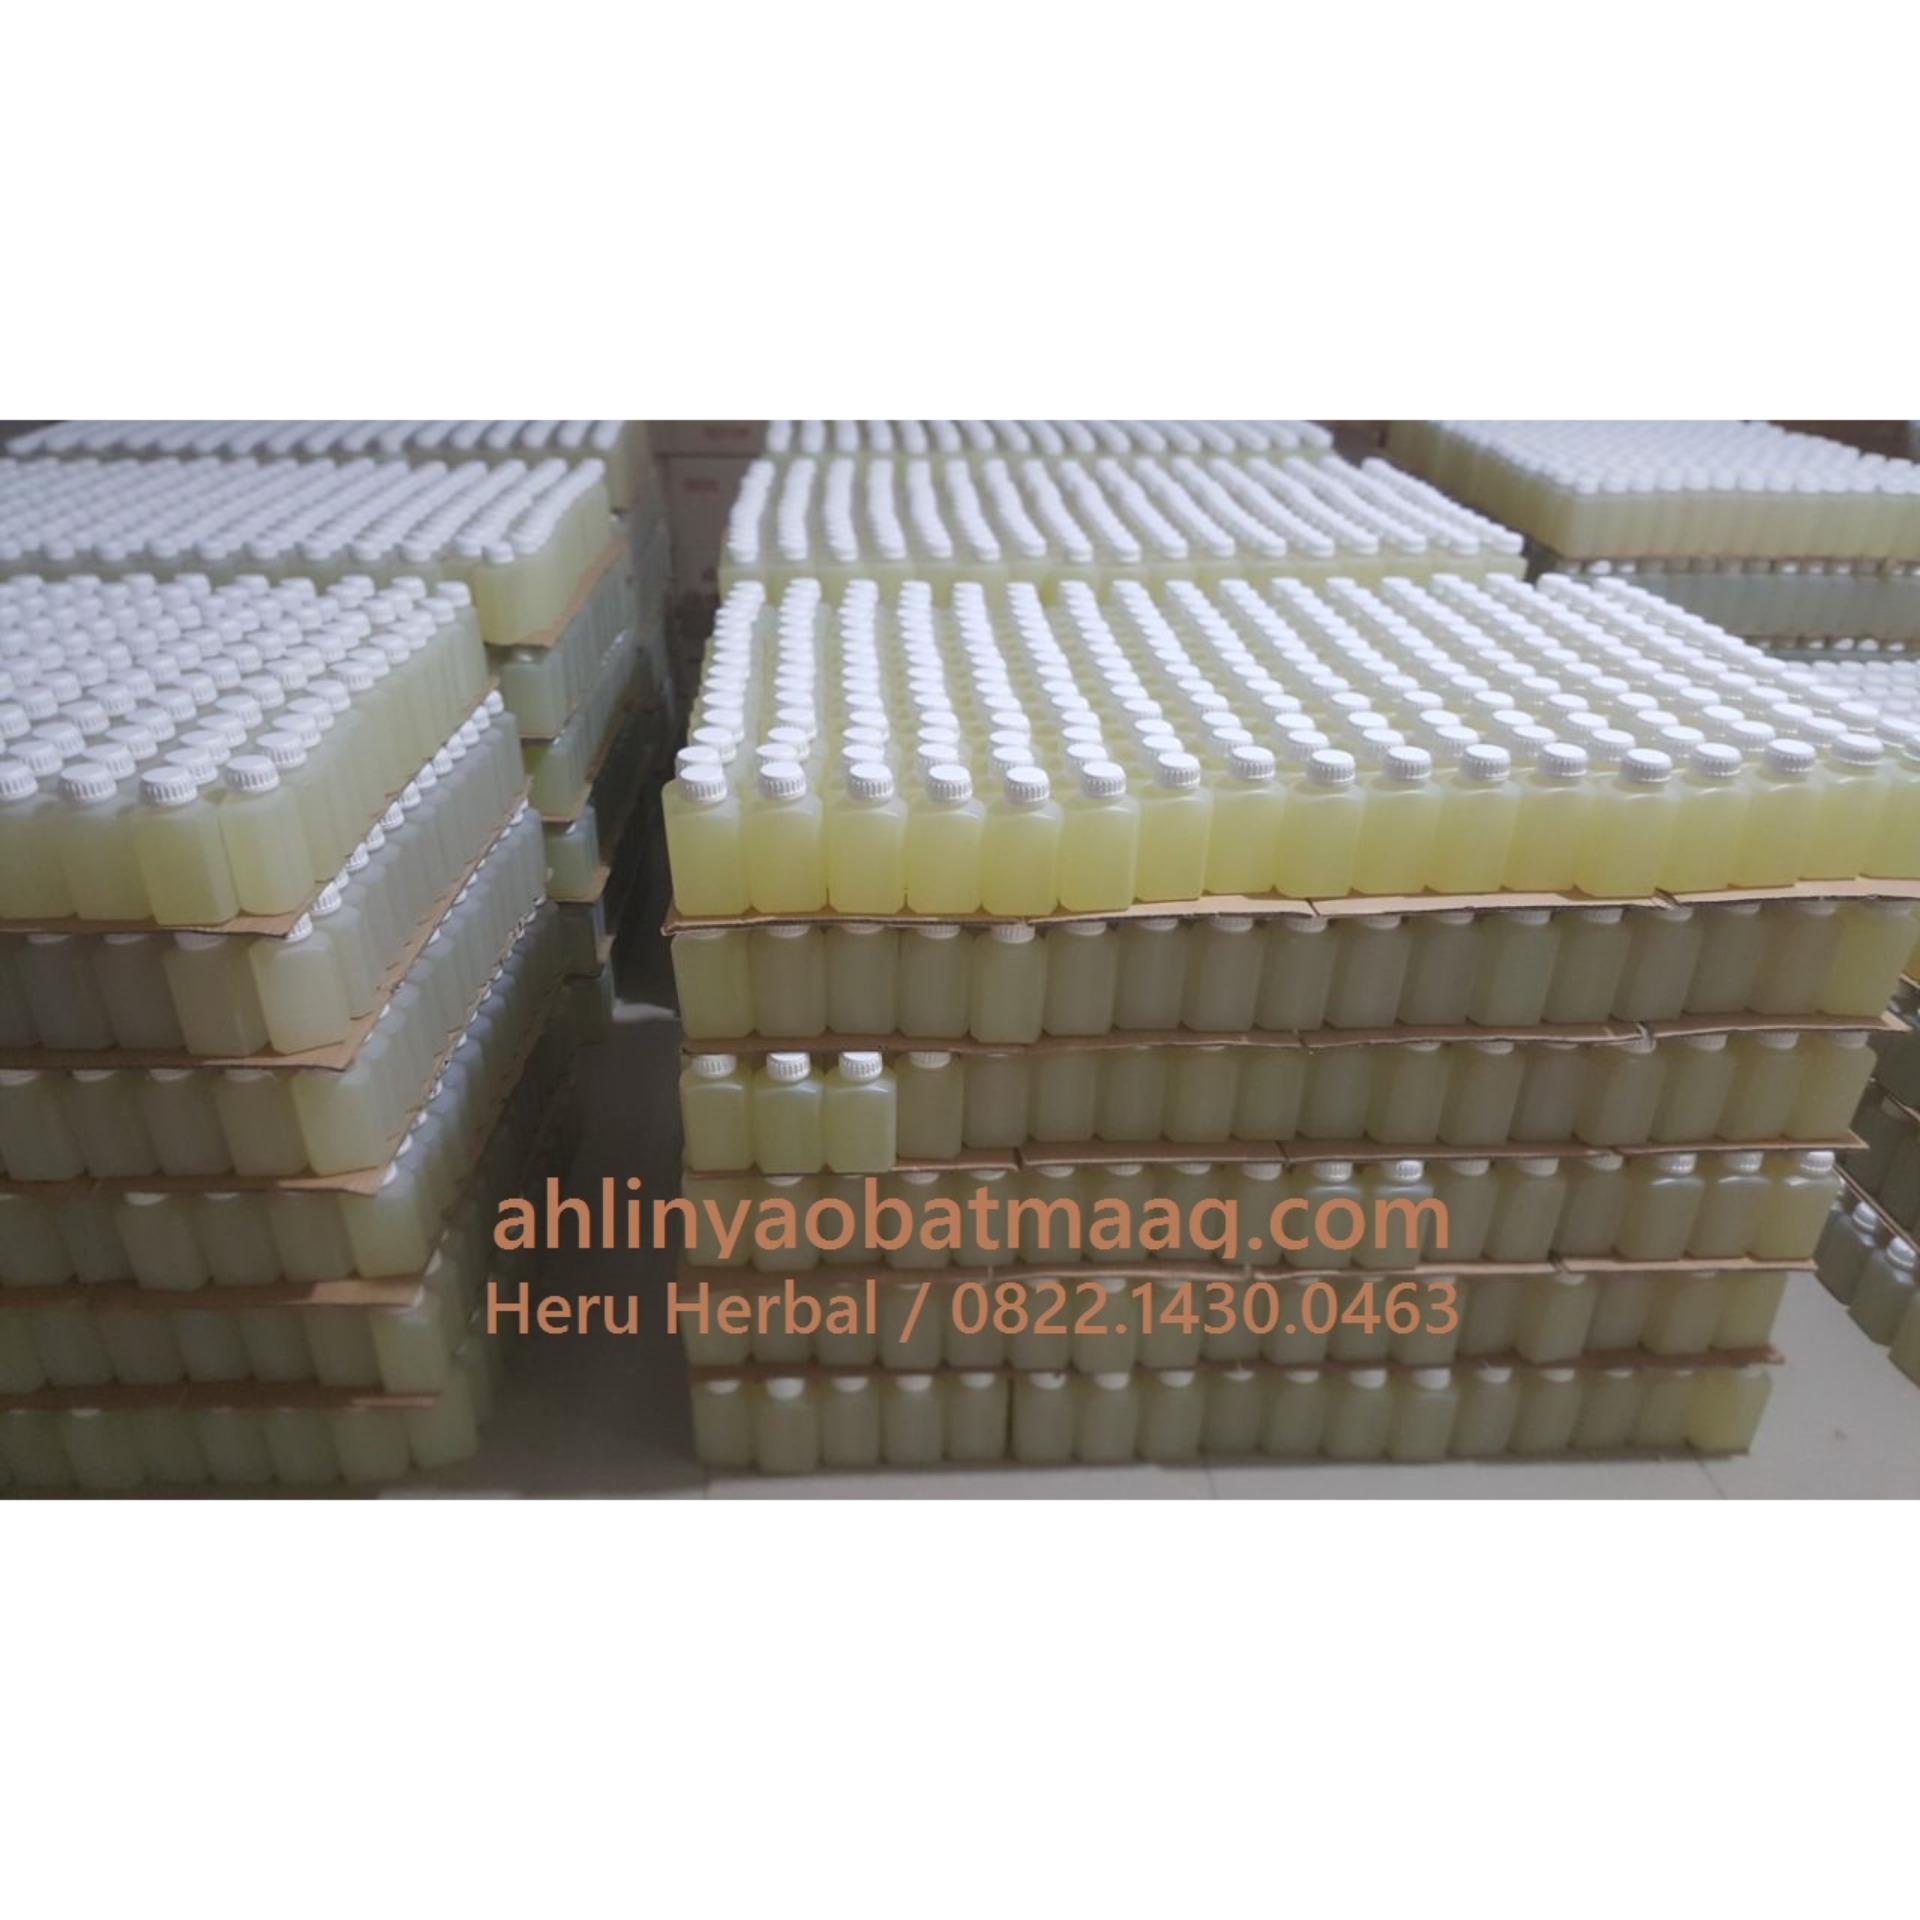 Obat Penyakit Kulit Alami Psoriasis Vitiligo Herpes Akut Herbal Diabetes Jelly Gamat Walatra